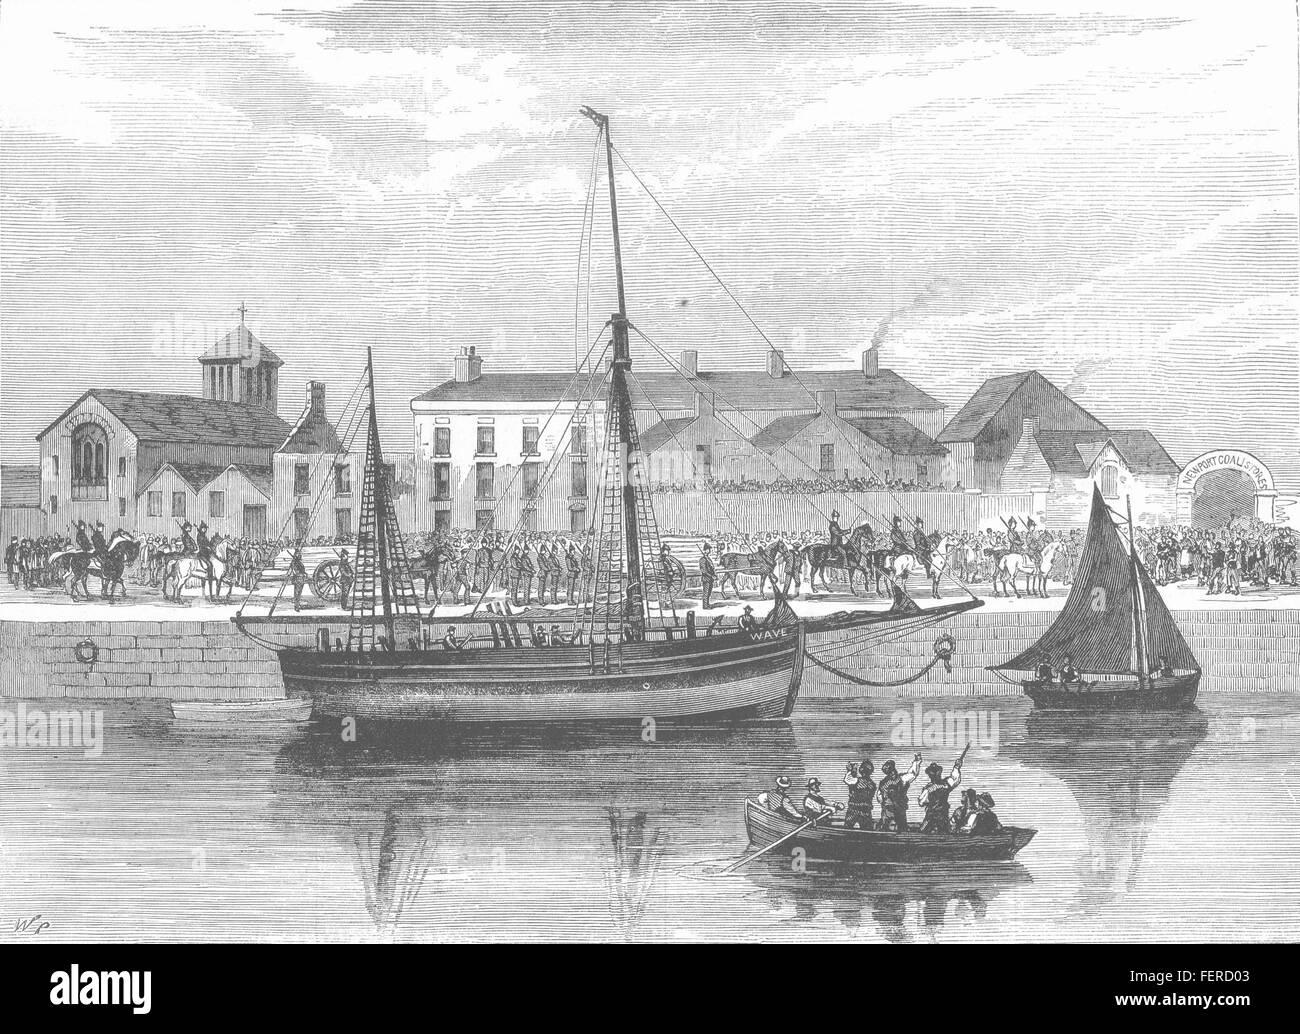 CORK The boycotted smack Wave, under police guard. Ireland 1881. Illustrated London News - Stock Image